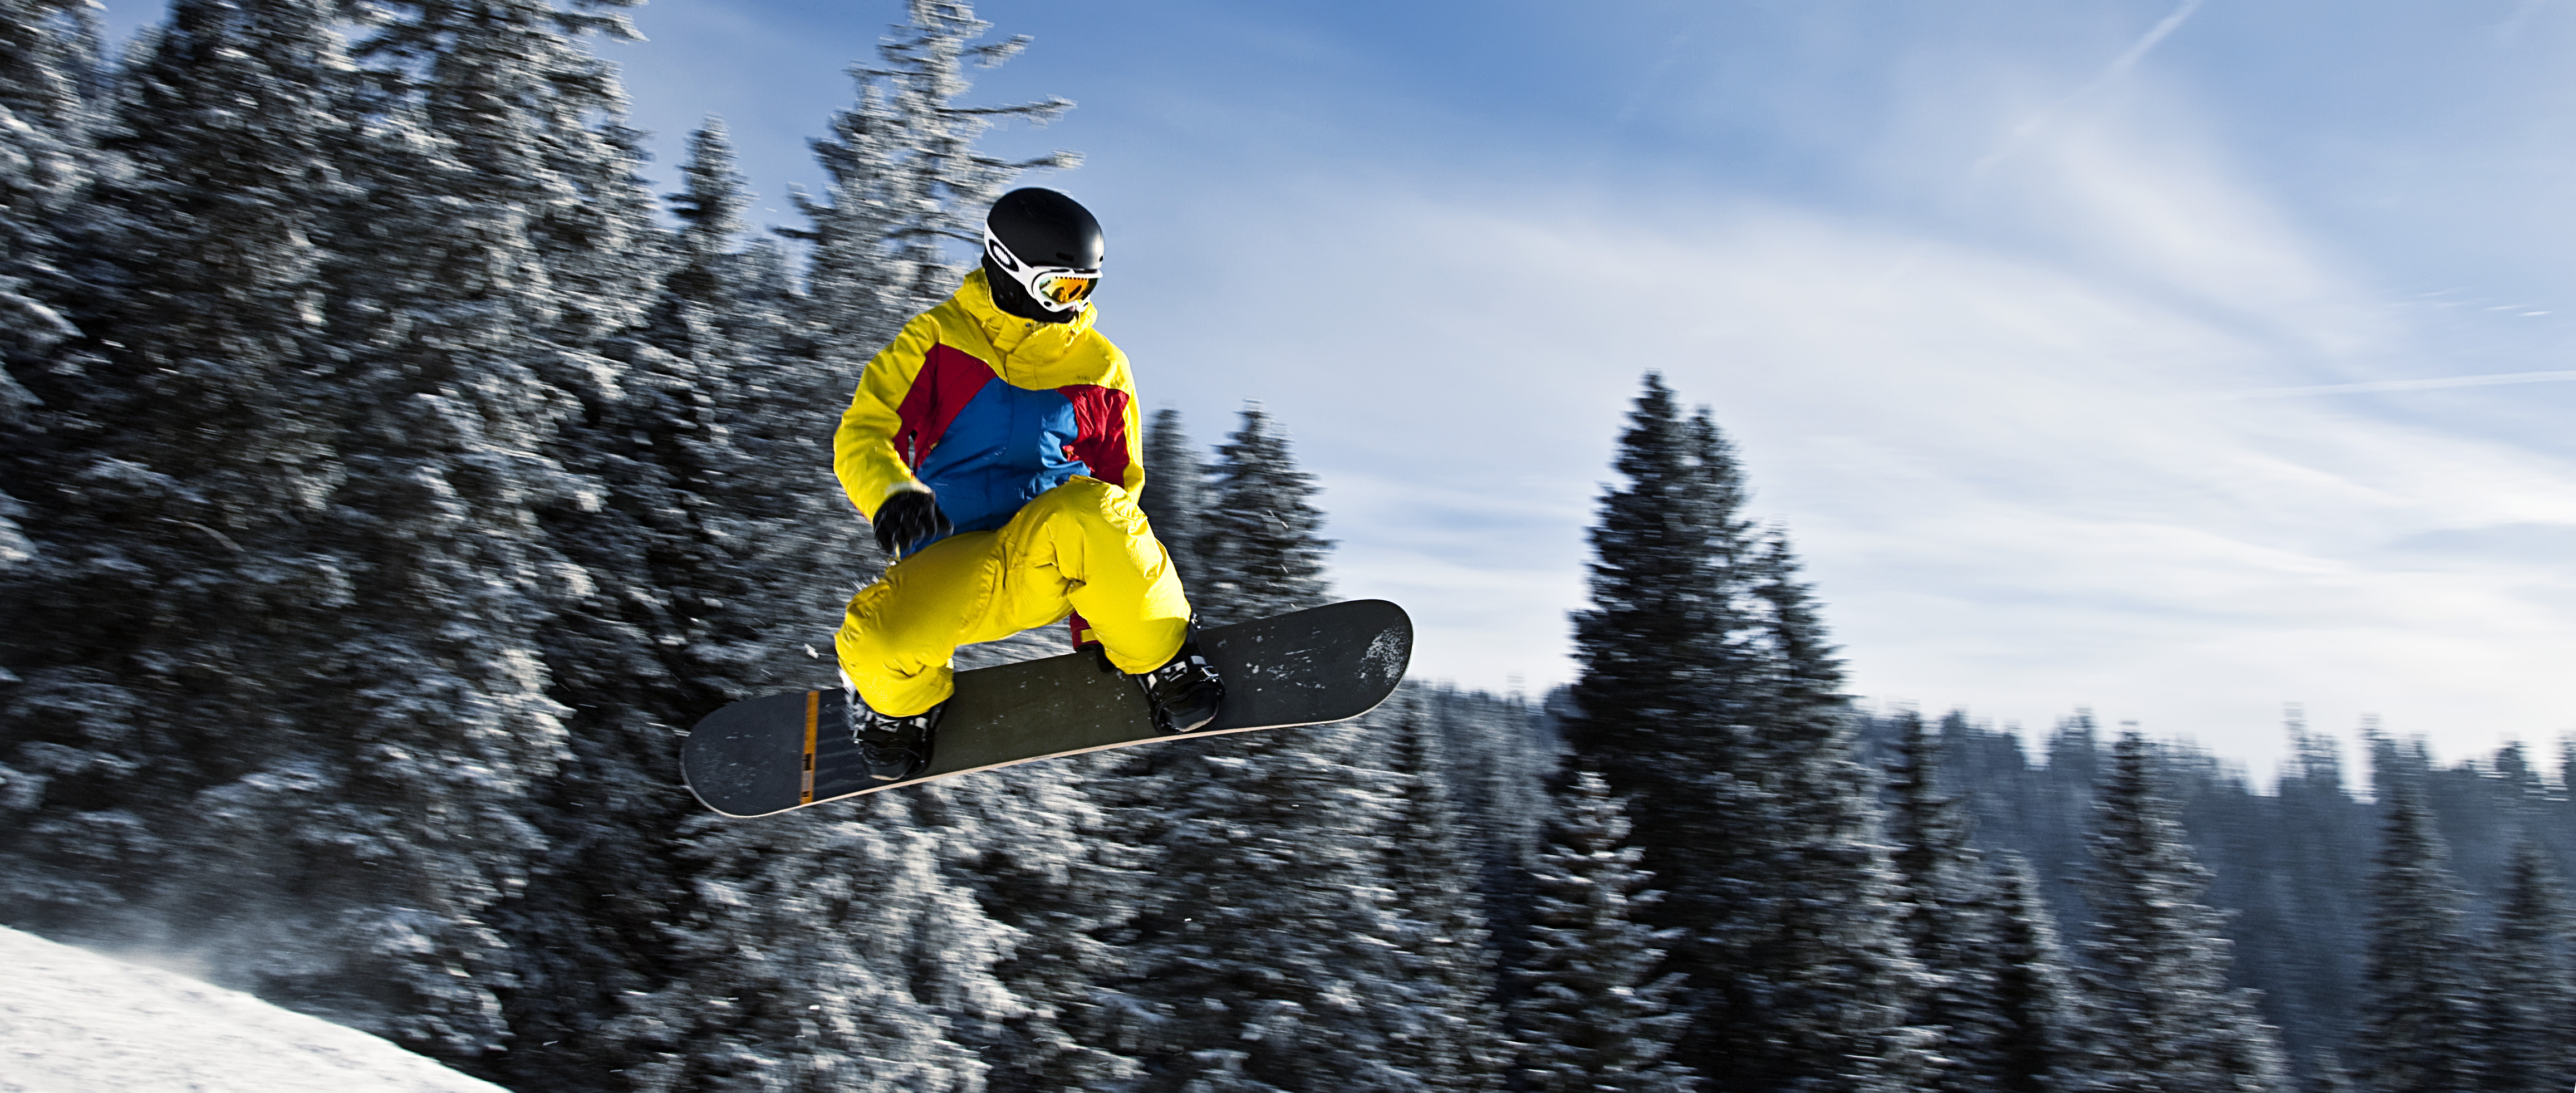 best snowboarding goggles  snowboarding